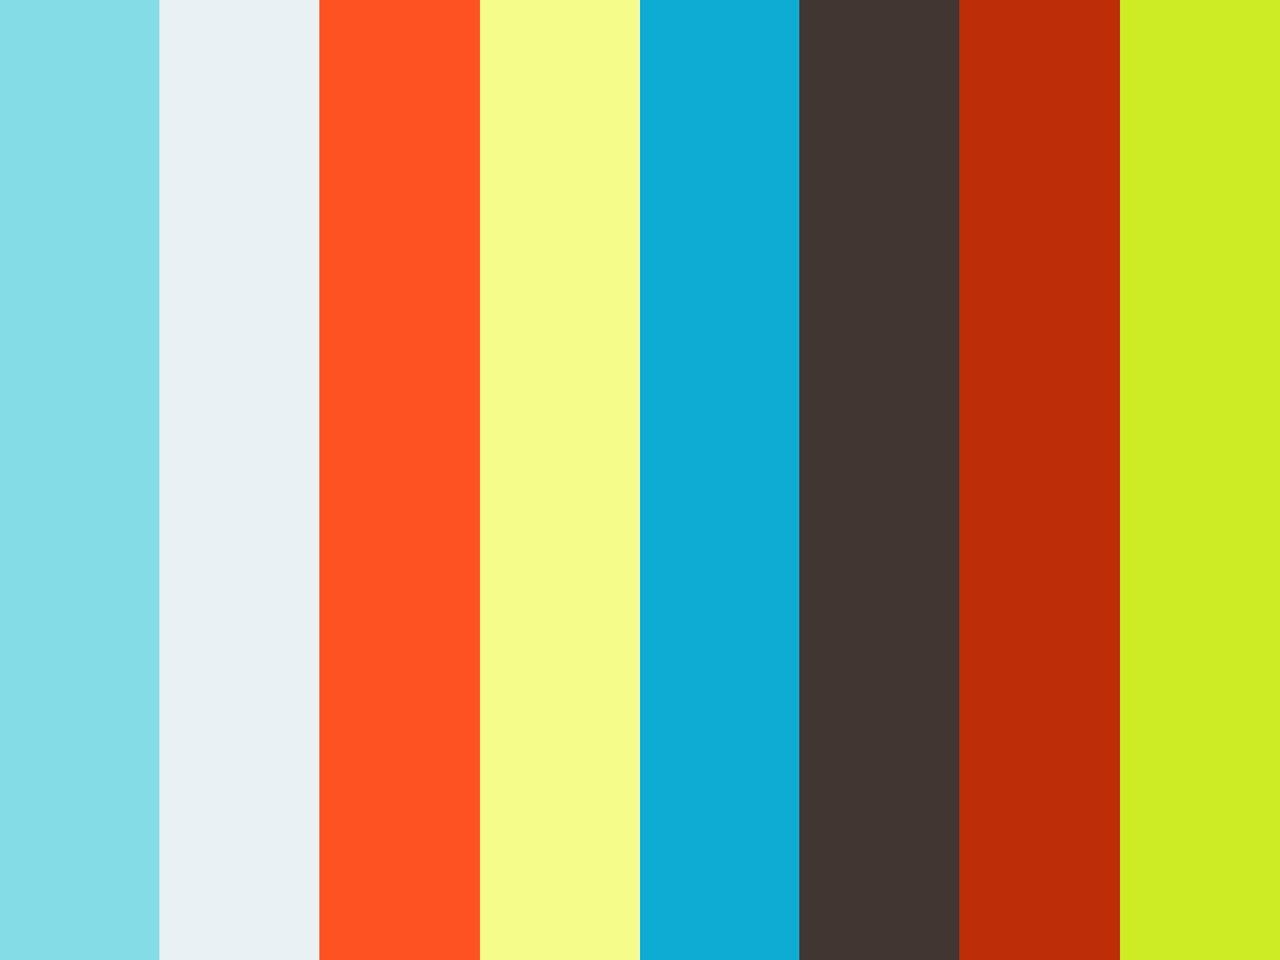 Incredible video analysis of radioheads daydreaming music video by incredible video analysis of radioheads daydreaming music video by raging cinema radiohead solutioingenieria Choice Image